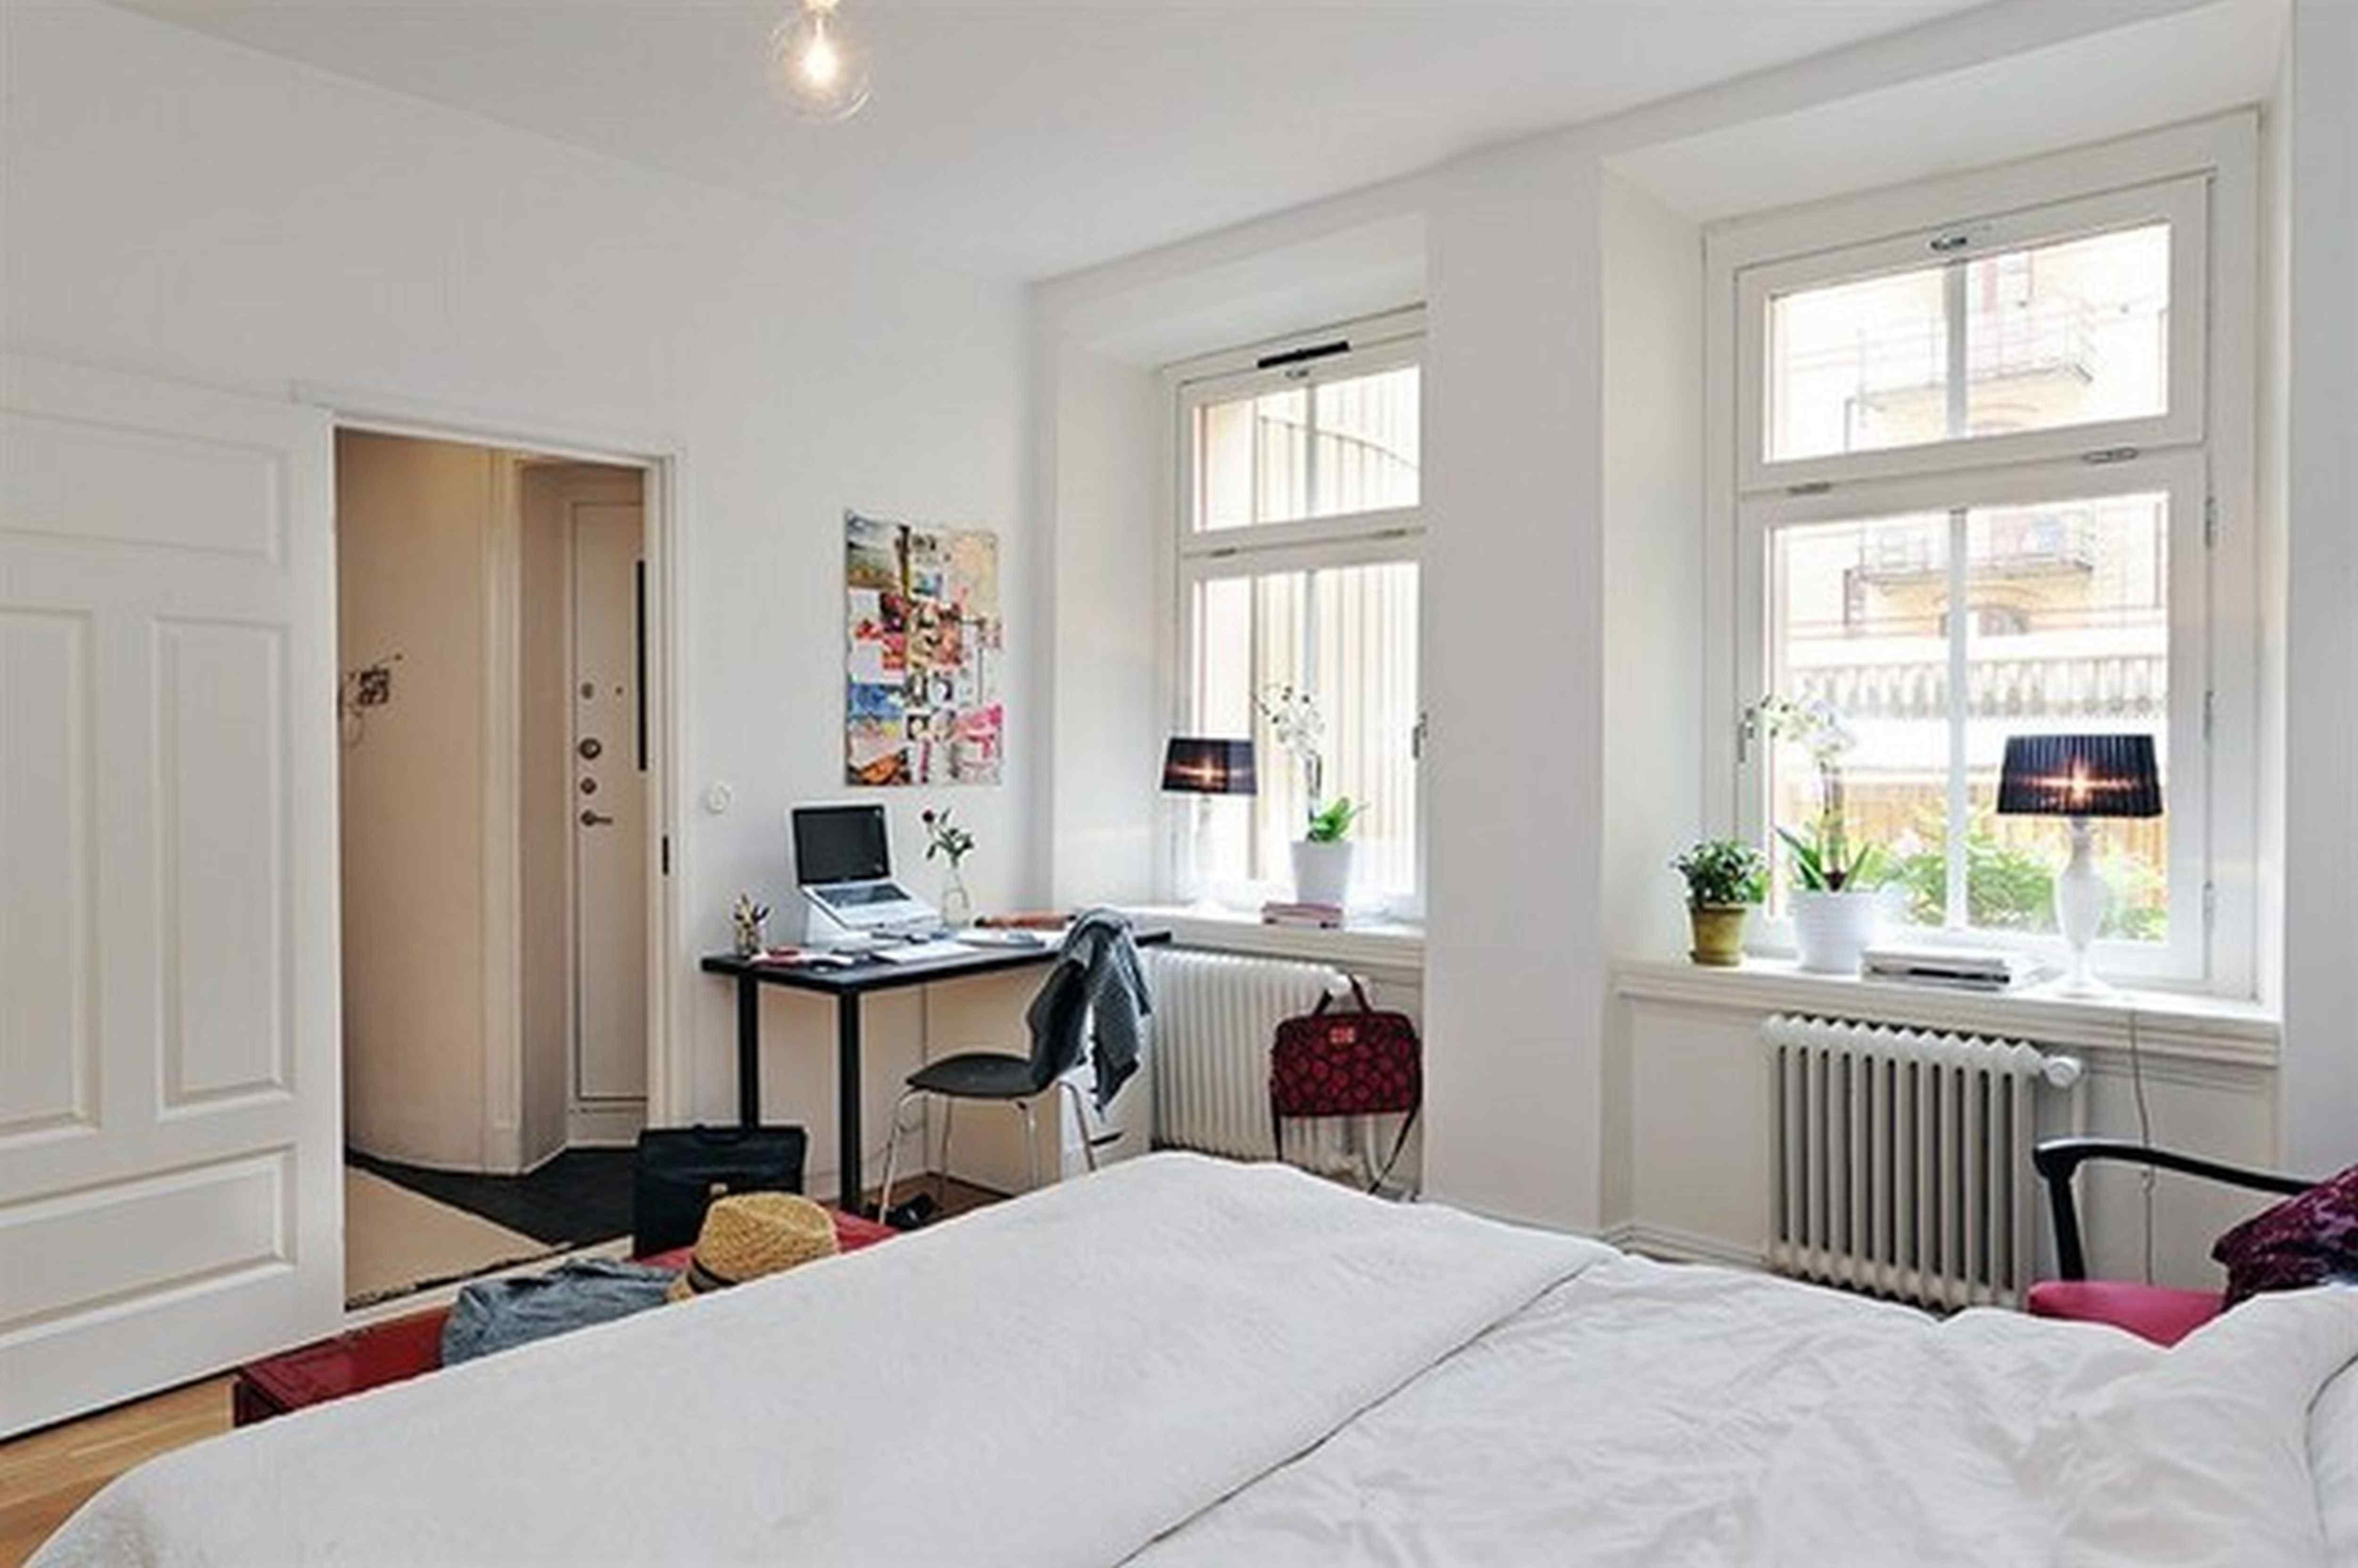 40 Beautiful Apartment Bedroom Decorating Ideas Small Apartment Room Small Bedroom Interior Interior Design Bedroom